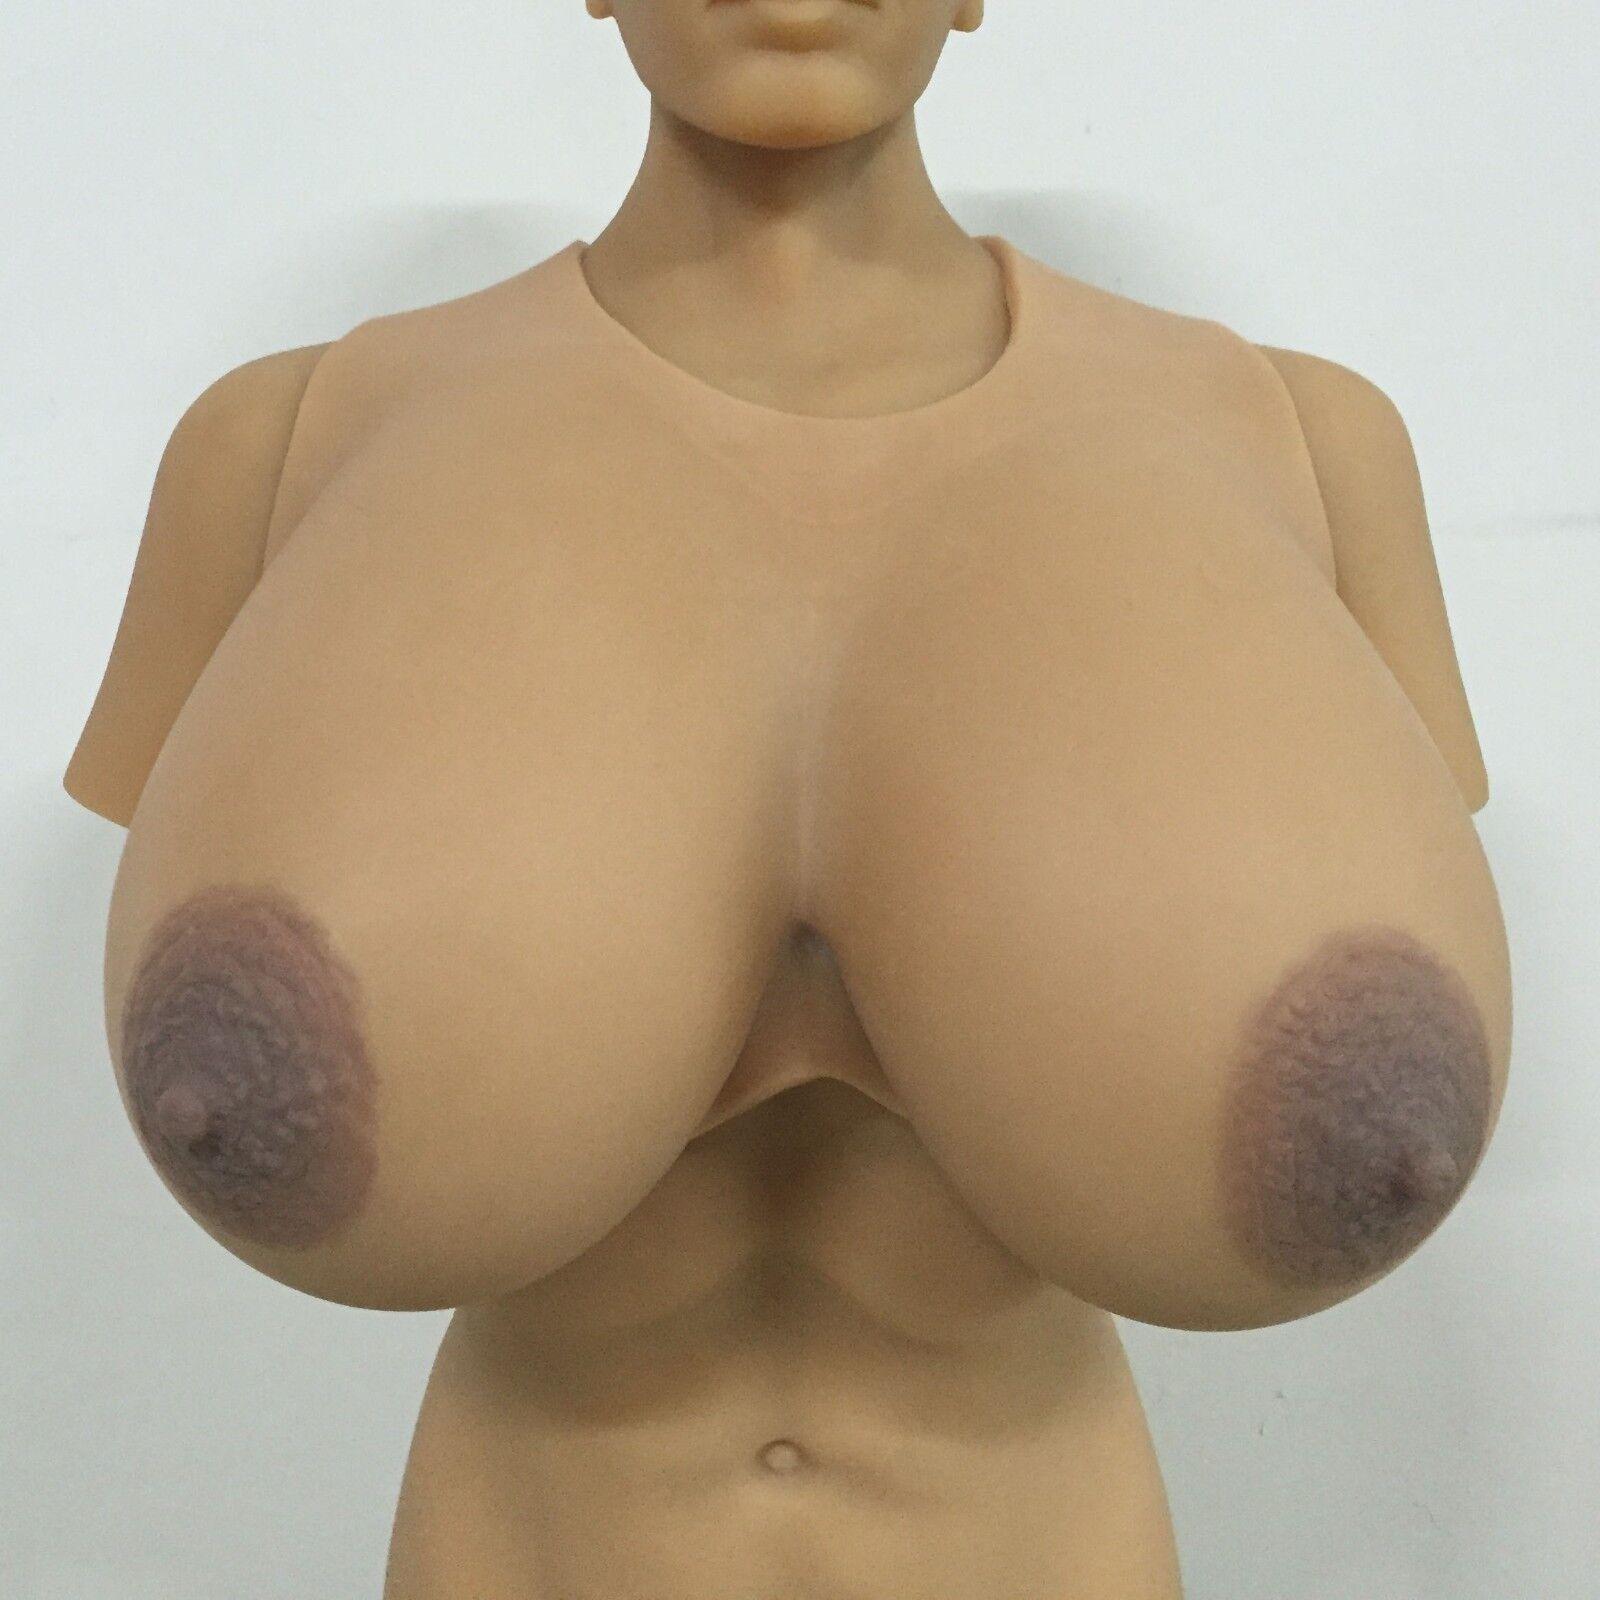 IVITA 16XL Huge Silicone Breast Form Crossdress 9.5KG Large Boob Enhancer